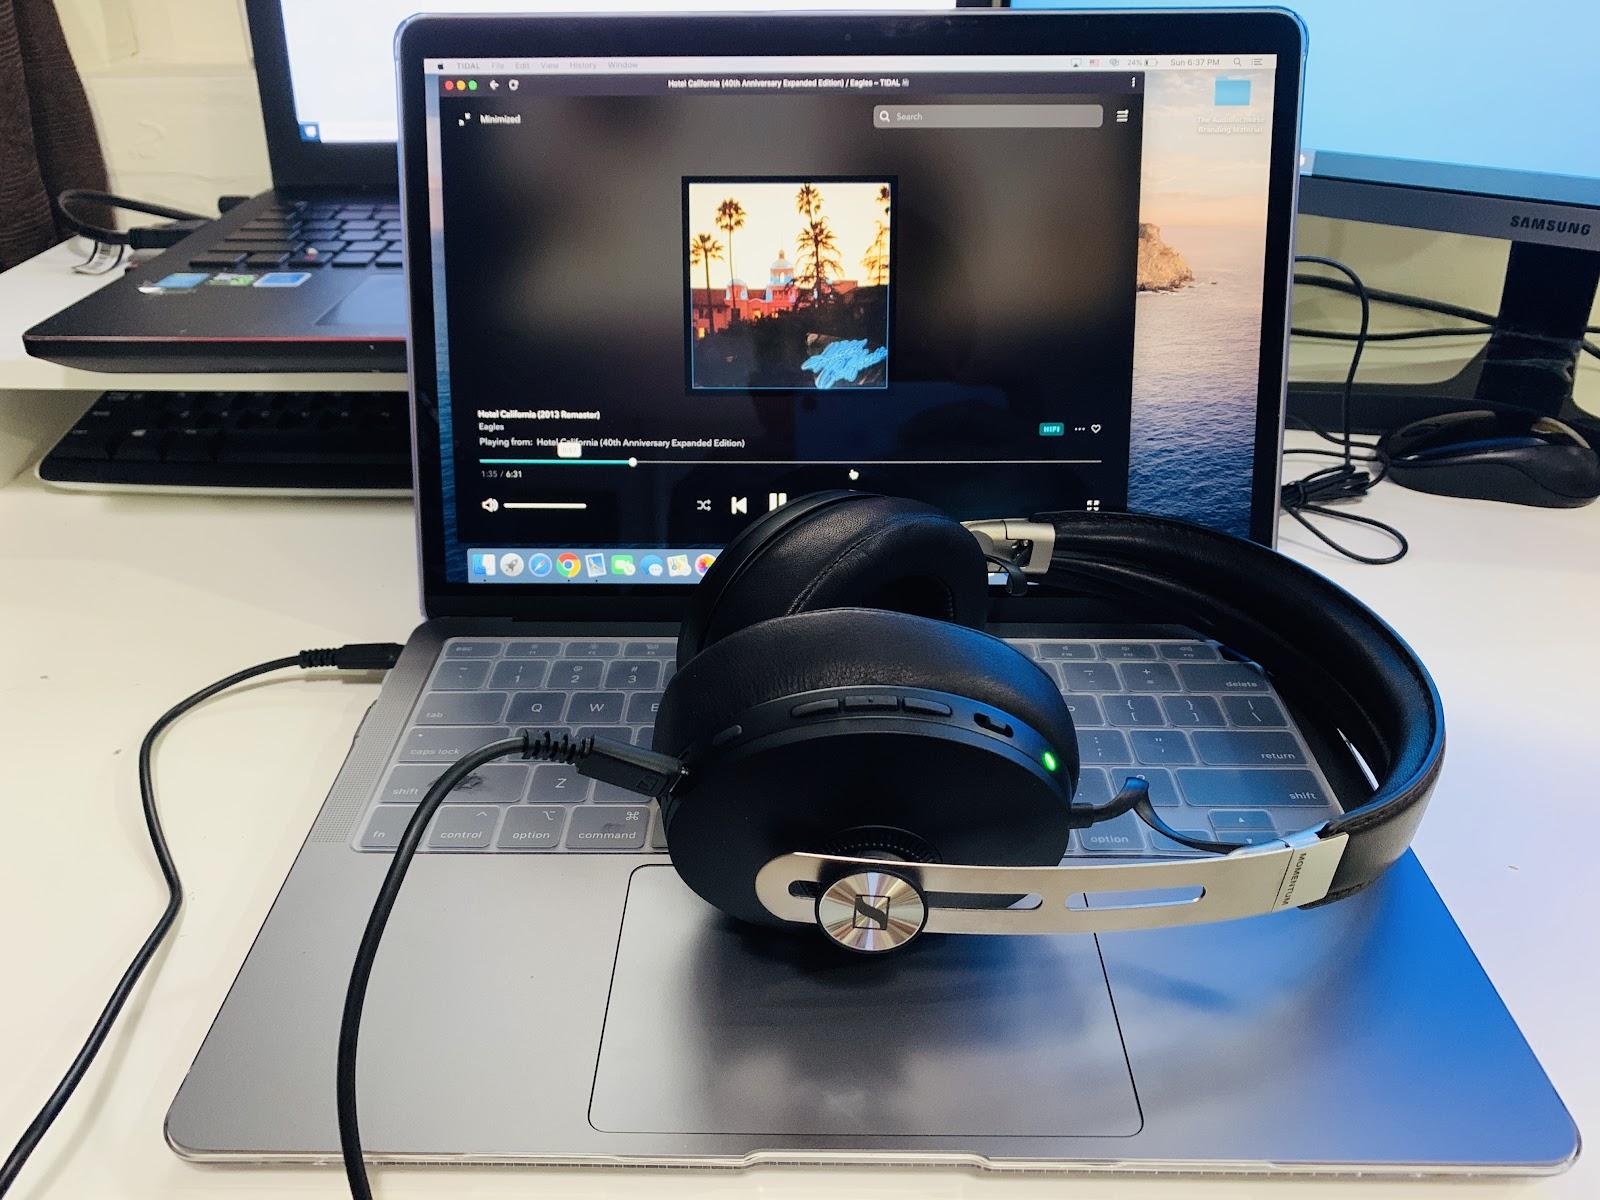 Connected Sennheiser MOMENTUM Wireless to my MacBook Air via USB Type-C